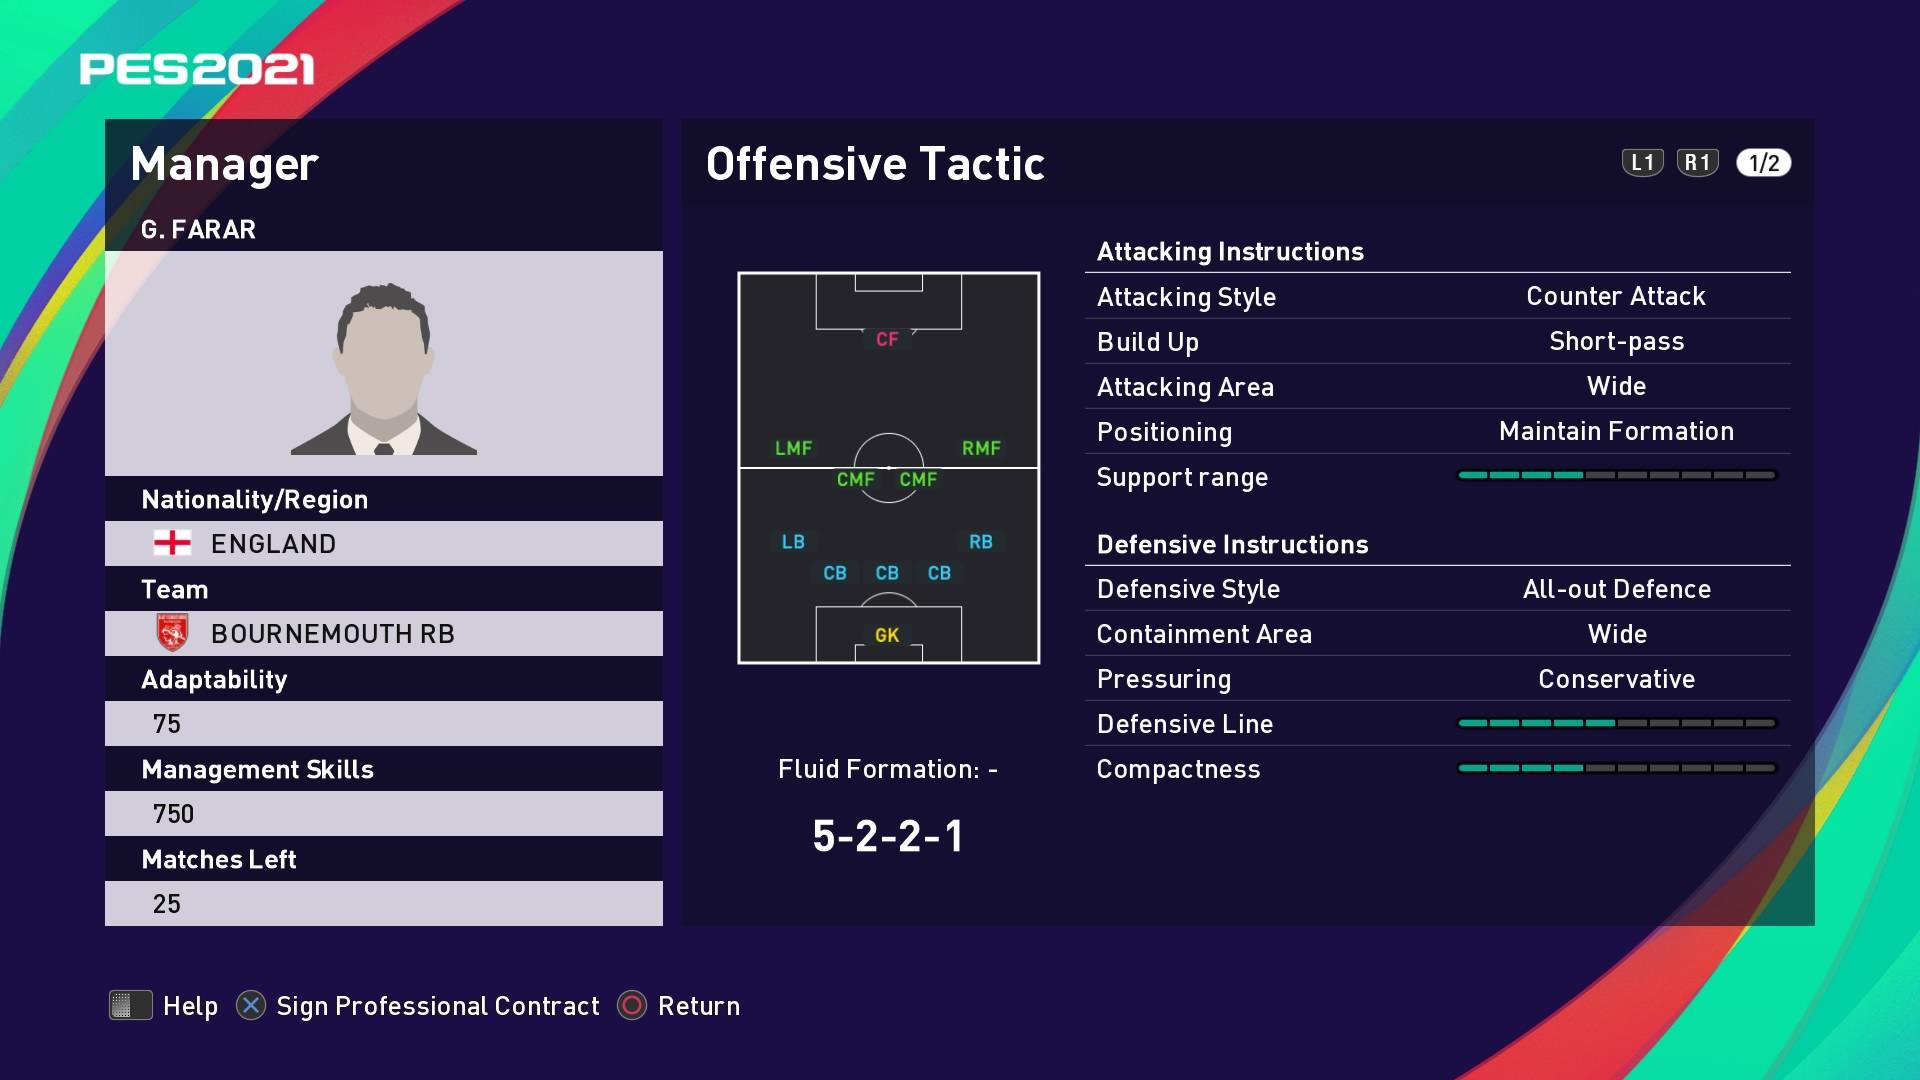 G. Farar (Jason Tindall) Offensive Tactic in PES 2021 myClub